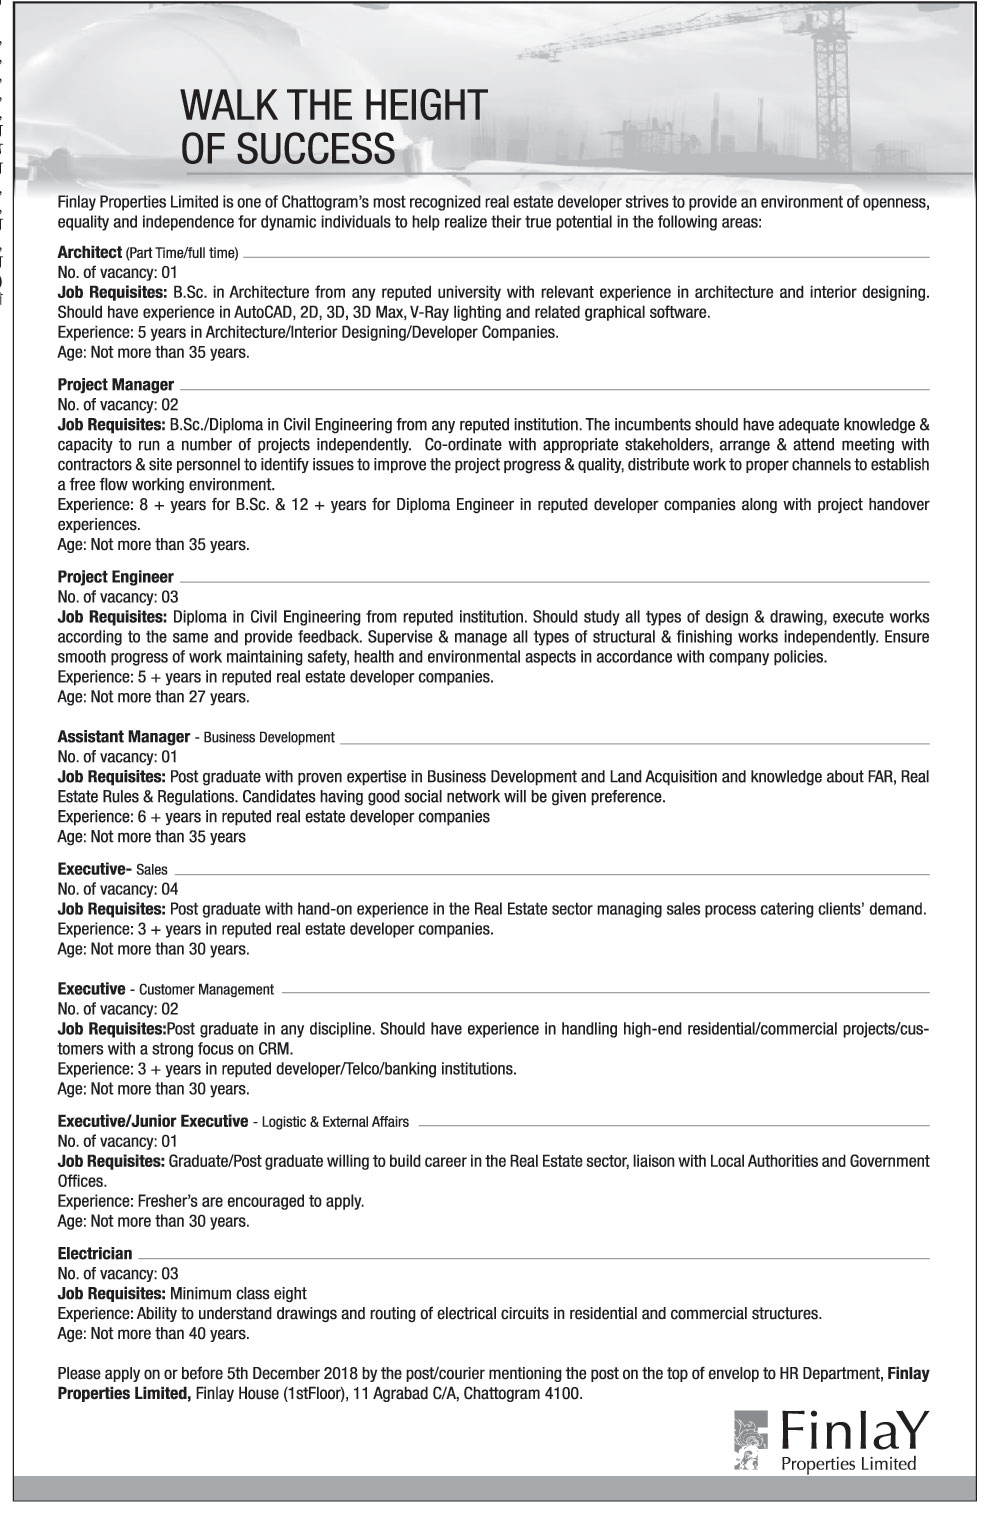 Finlay Properties Limited Job Circular 2018 | www